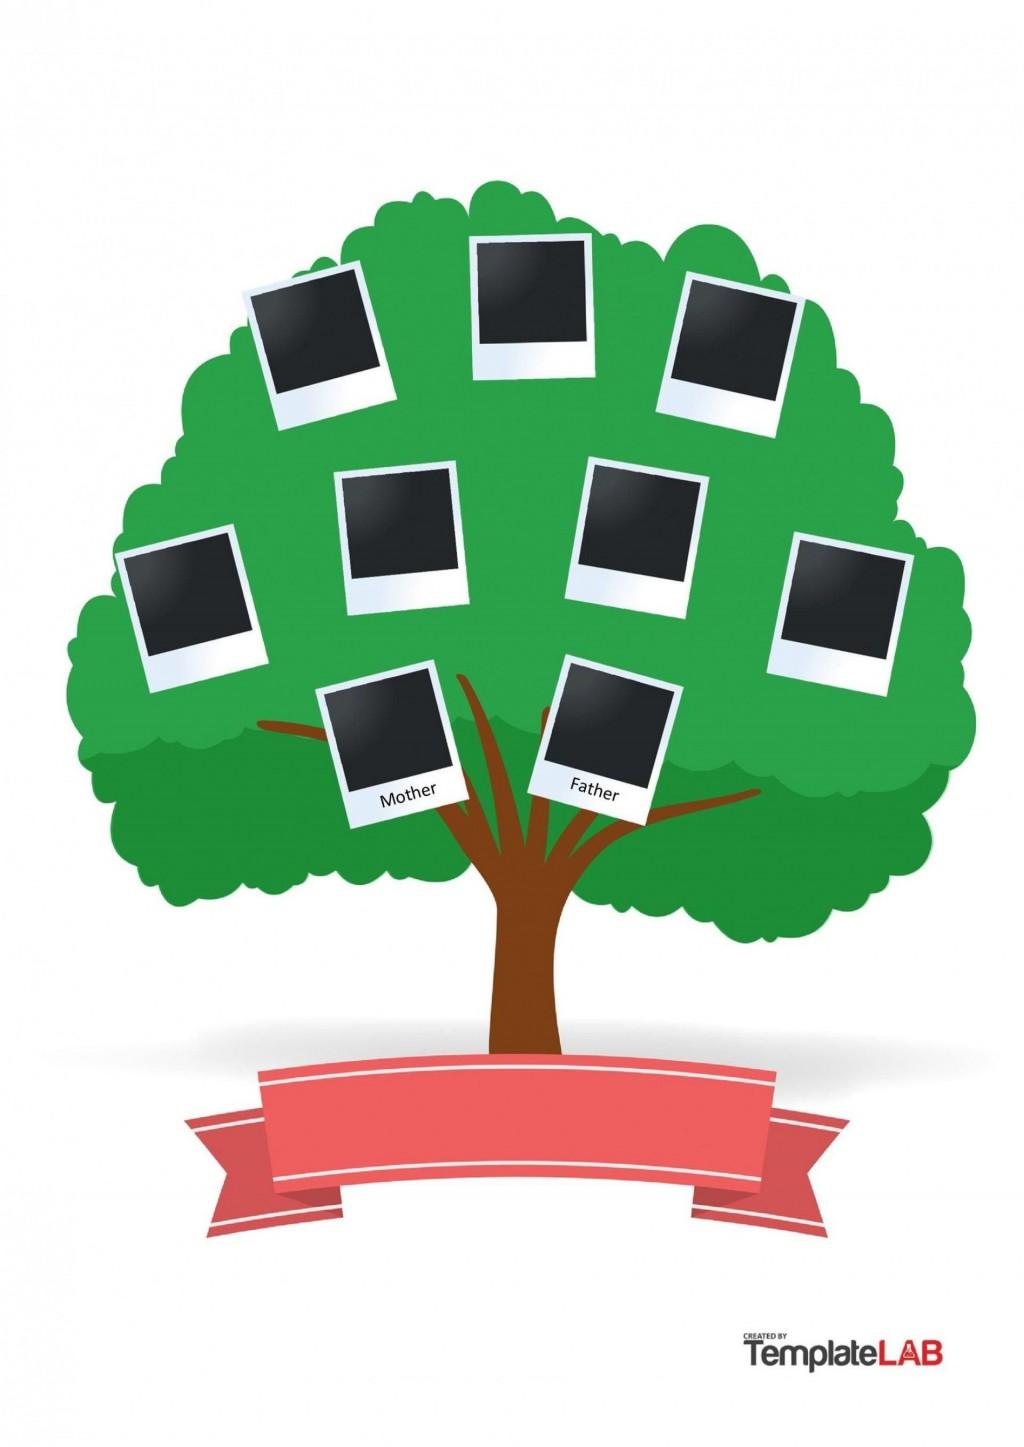 008 Fantastic Free Editable Family Tree Template For Mac Image Large